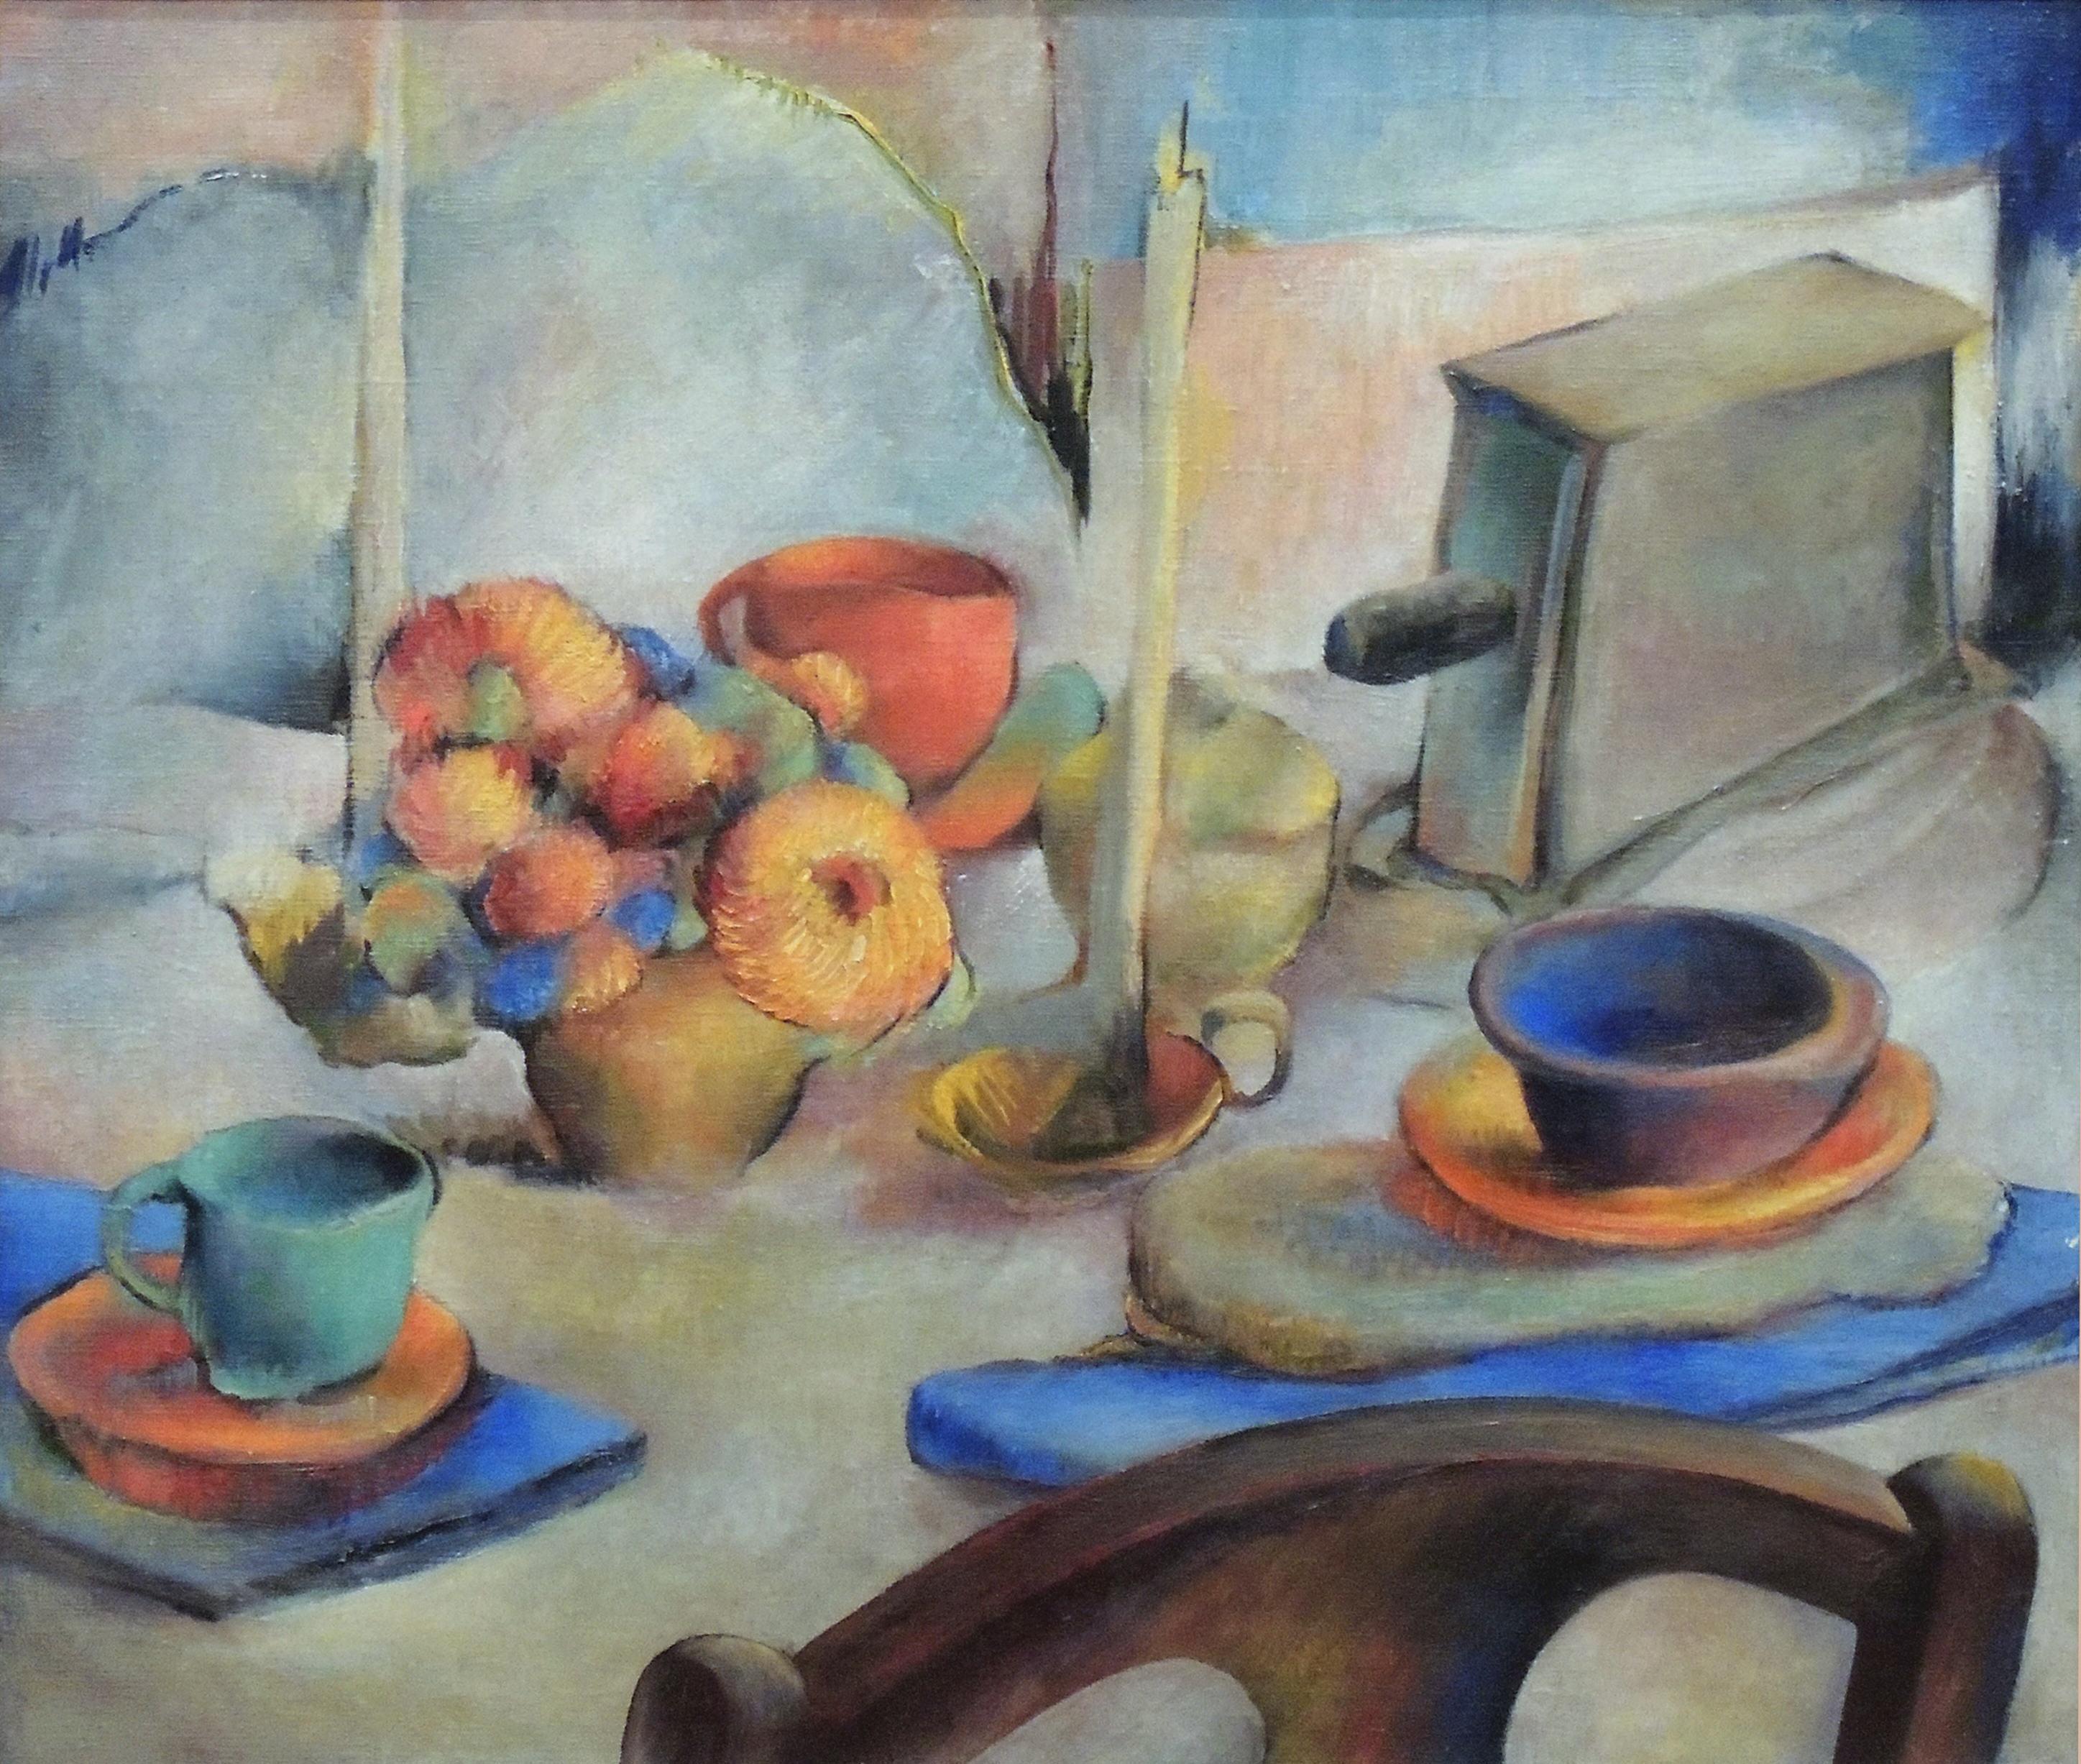 "1989.007 | Ralston Thompson | THE TABLE | oil on canvas | 24-1/8 x 28"" | 1935 | Gift of Mrs. Ralston Thompson"